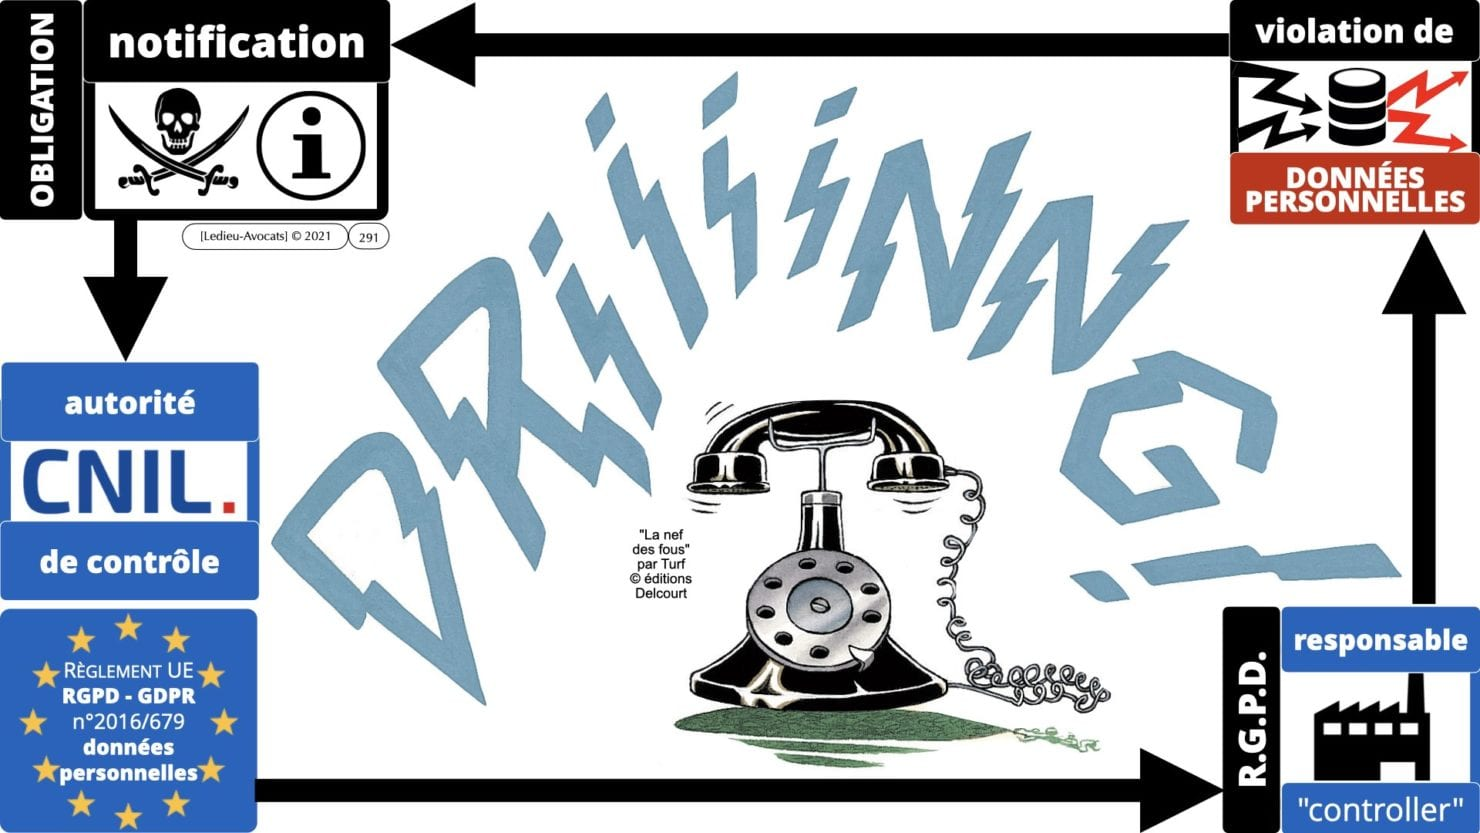 RGPD e-Privacy principes actualité jurisprudence ©Ledieu-Avocats 25-06-2021.291